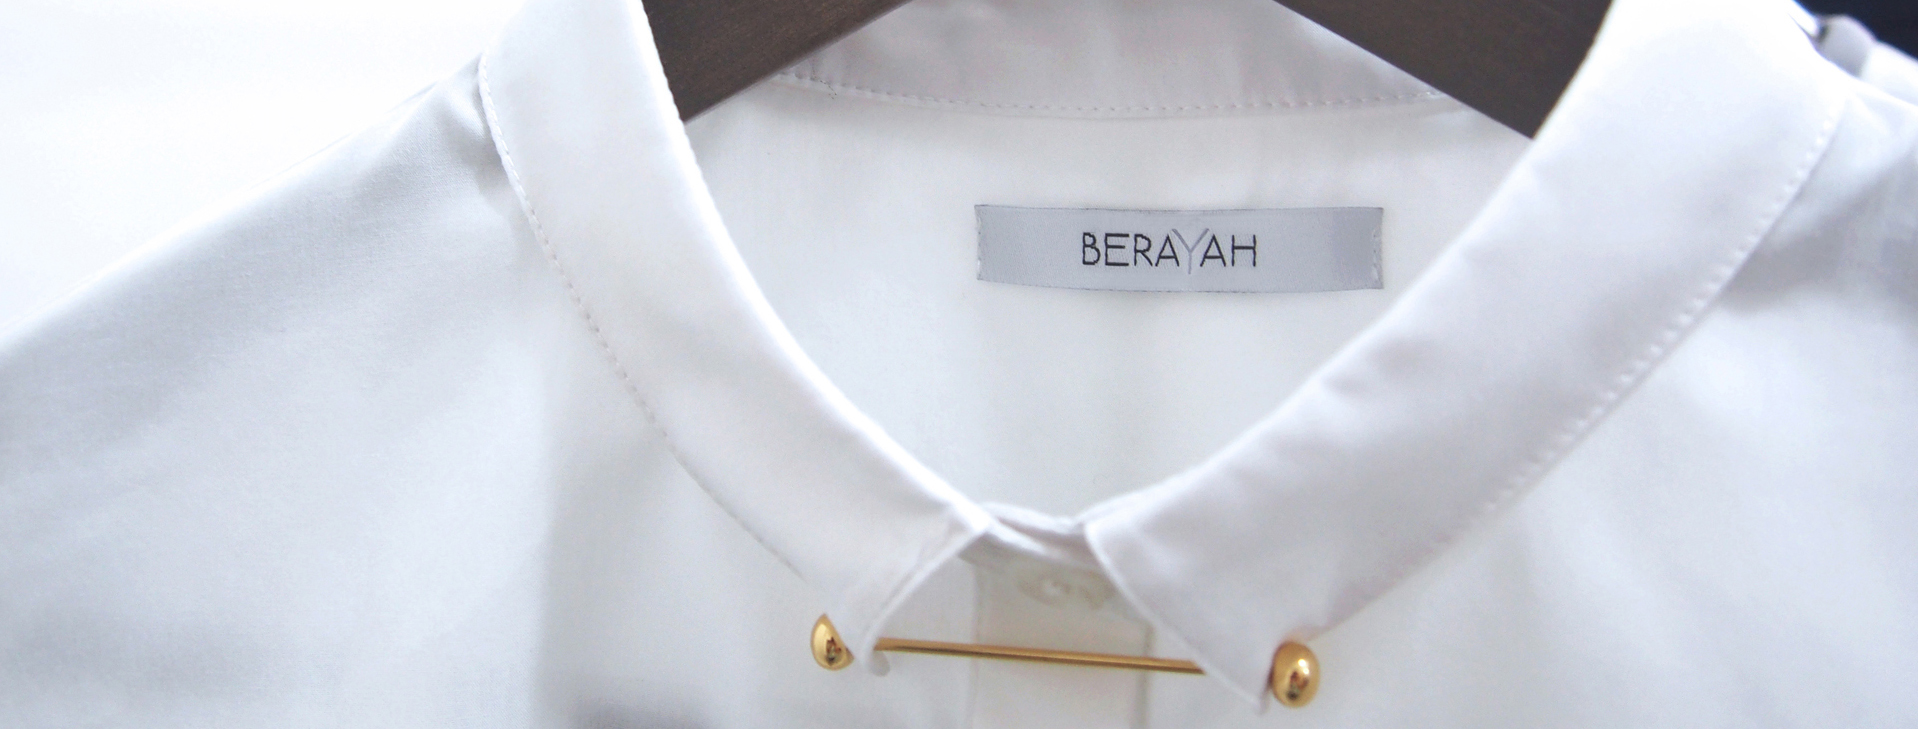 Shirt Closeup2.jpg